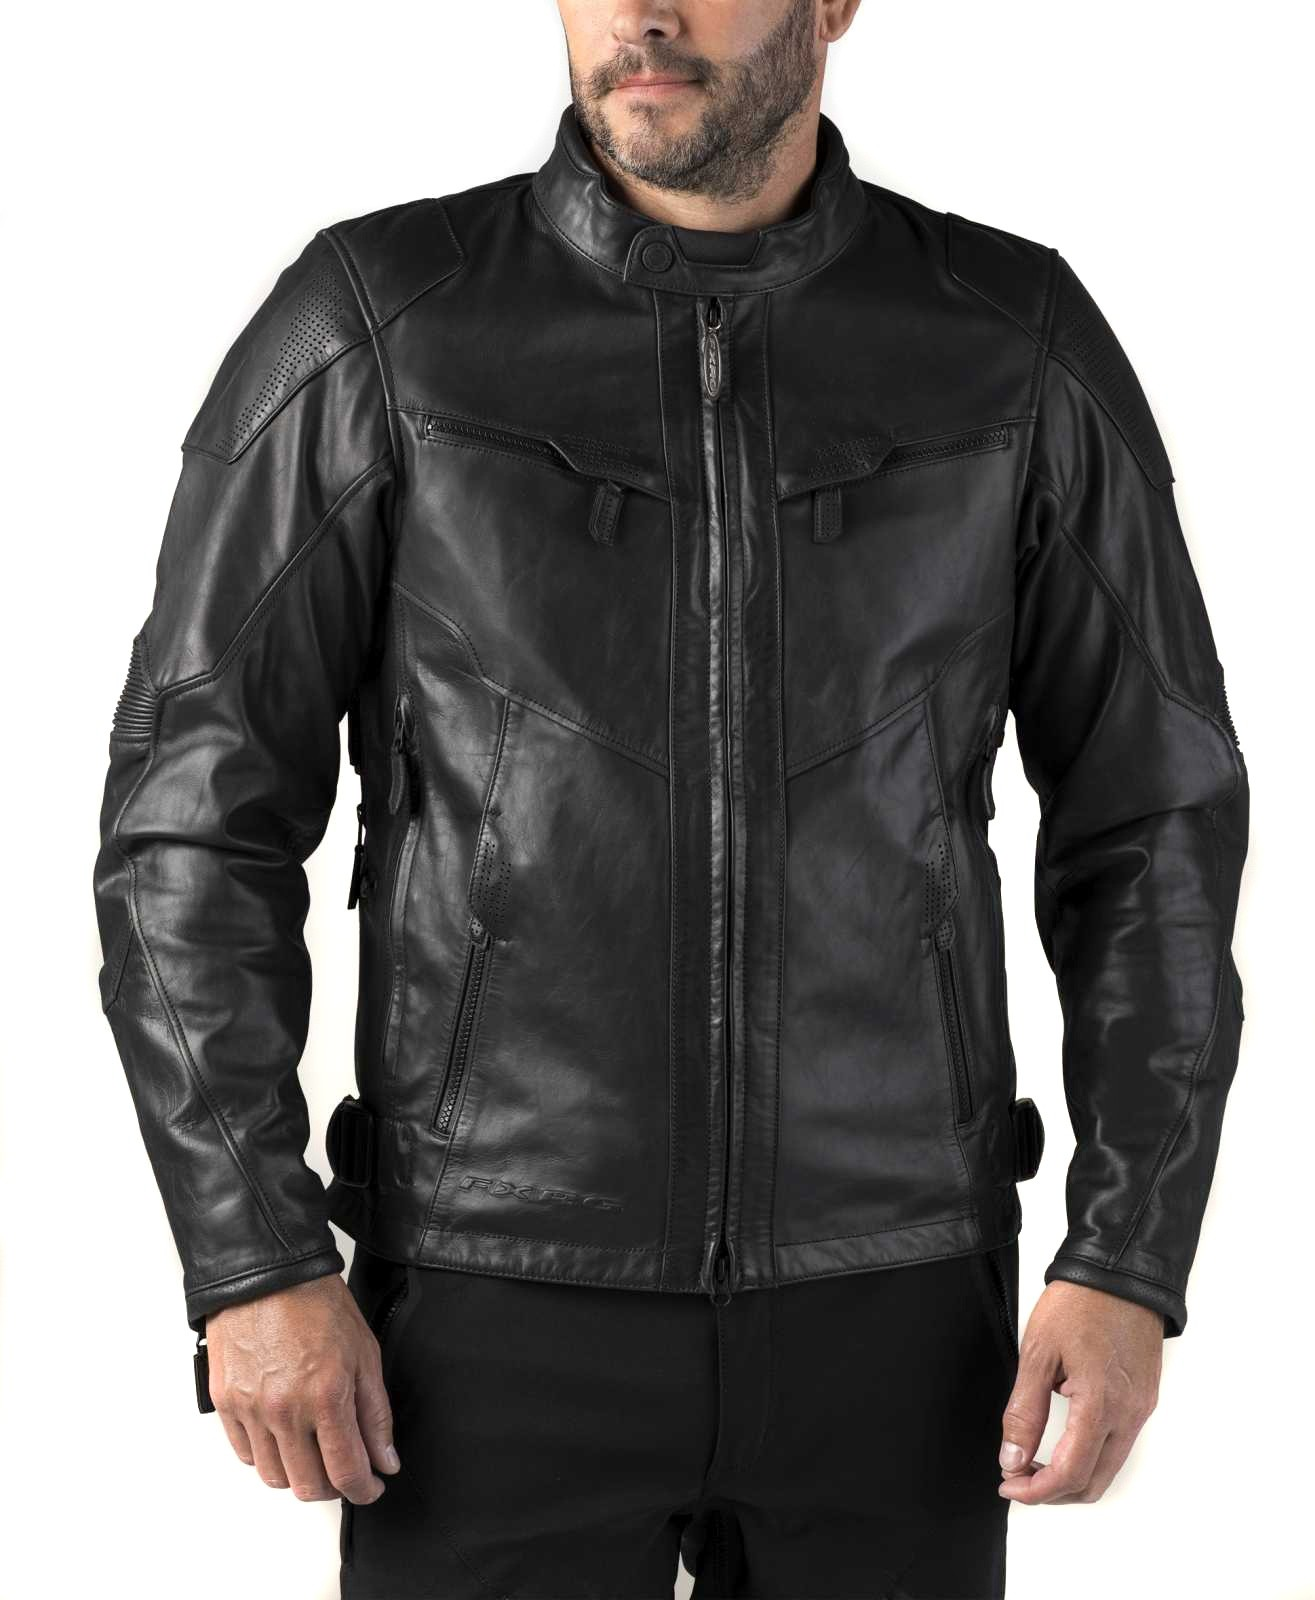 Cazadora Hombre Harley Davidson Fxrg Triple Vent System Leather Jacket Waterproof Ce